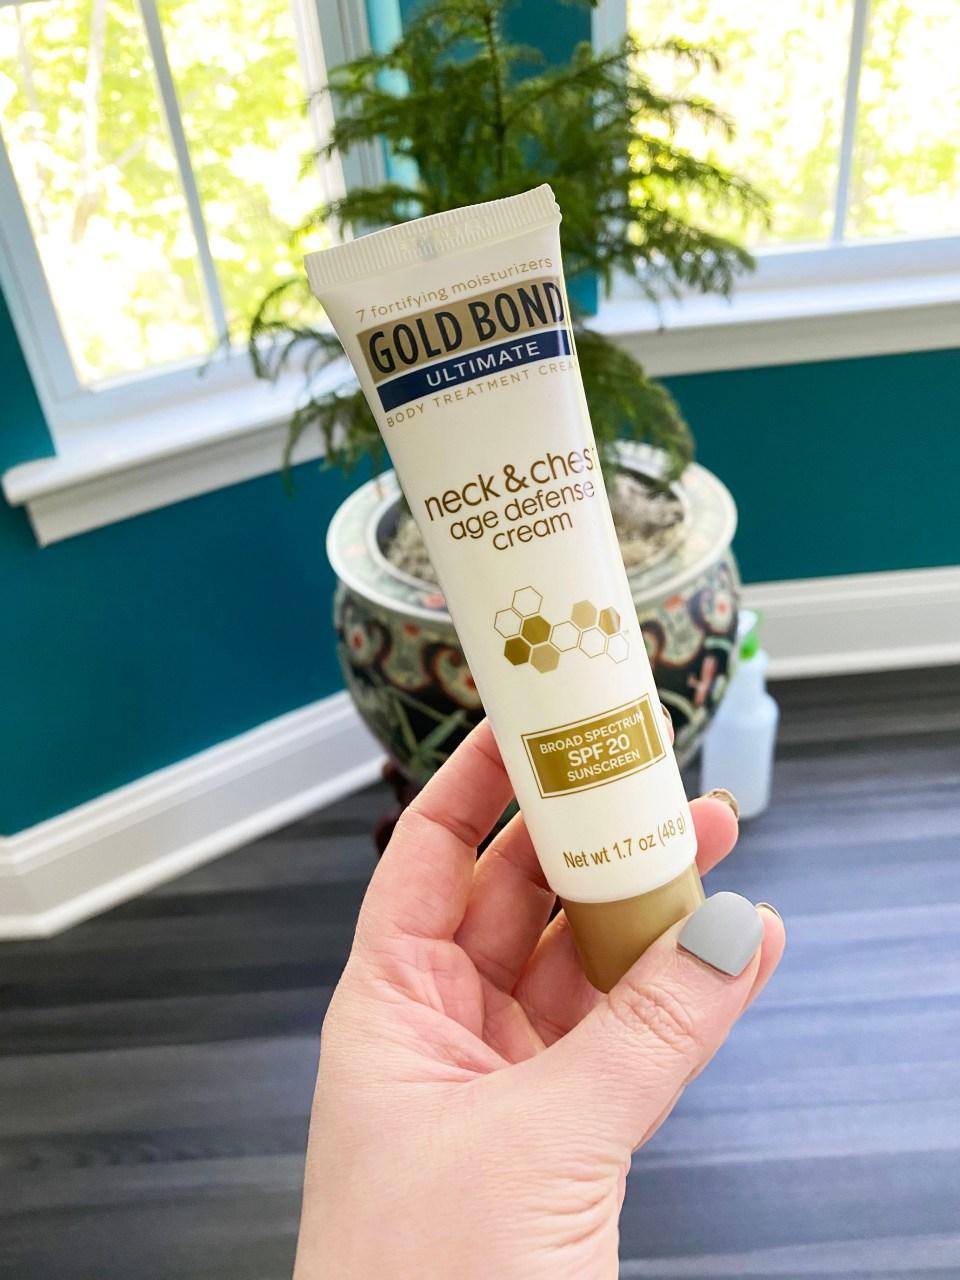 Gold Bond Neck & Chest Cream